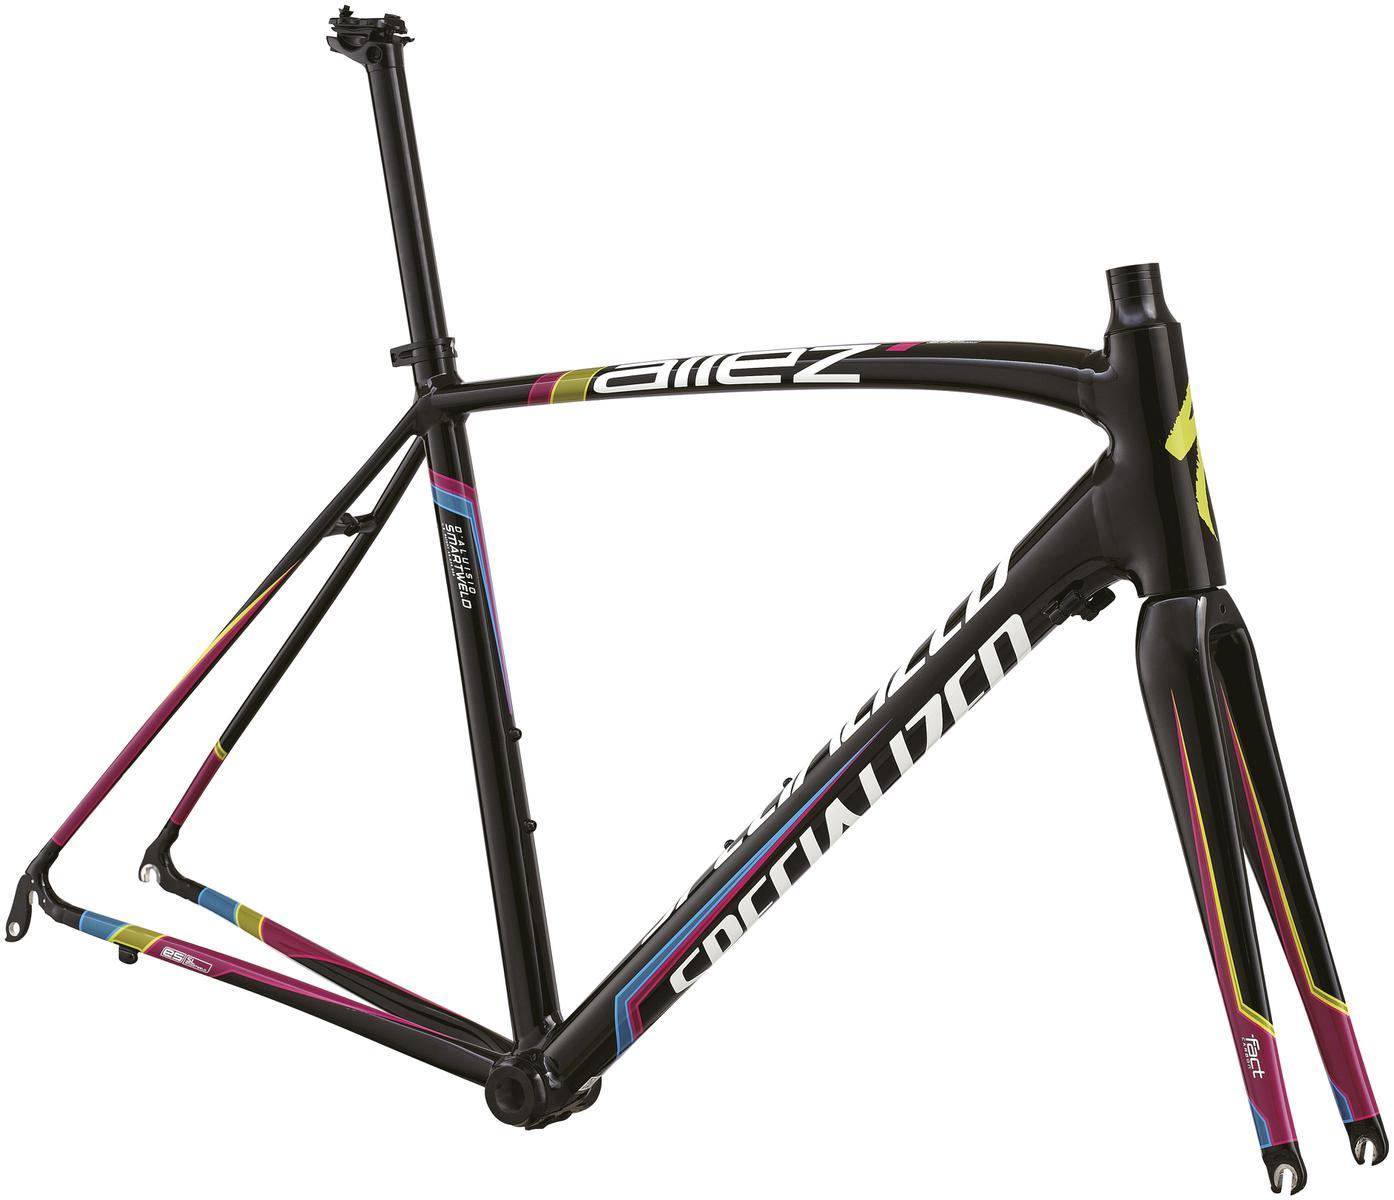 Specialized Allez E5 Rahmenset Fahrradrahmen Rennrad 2015